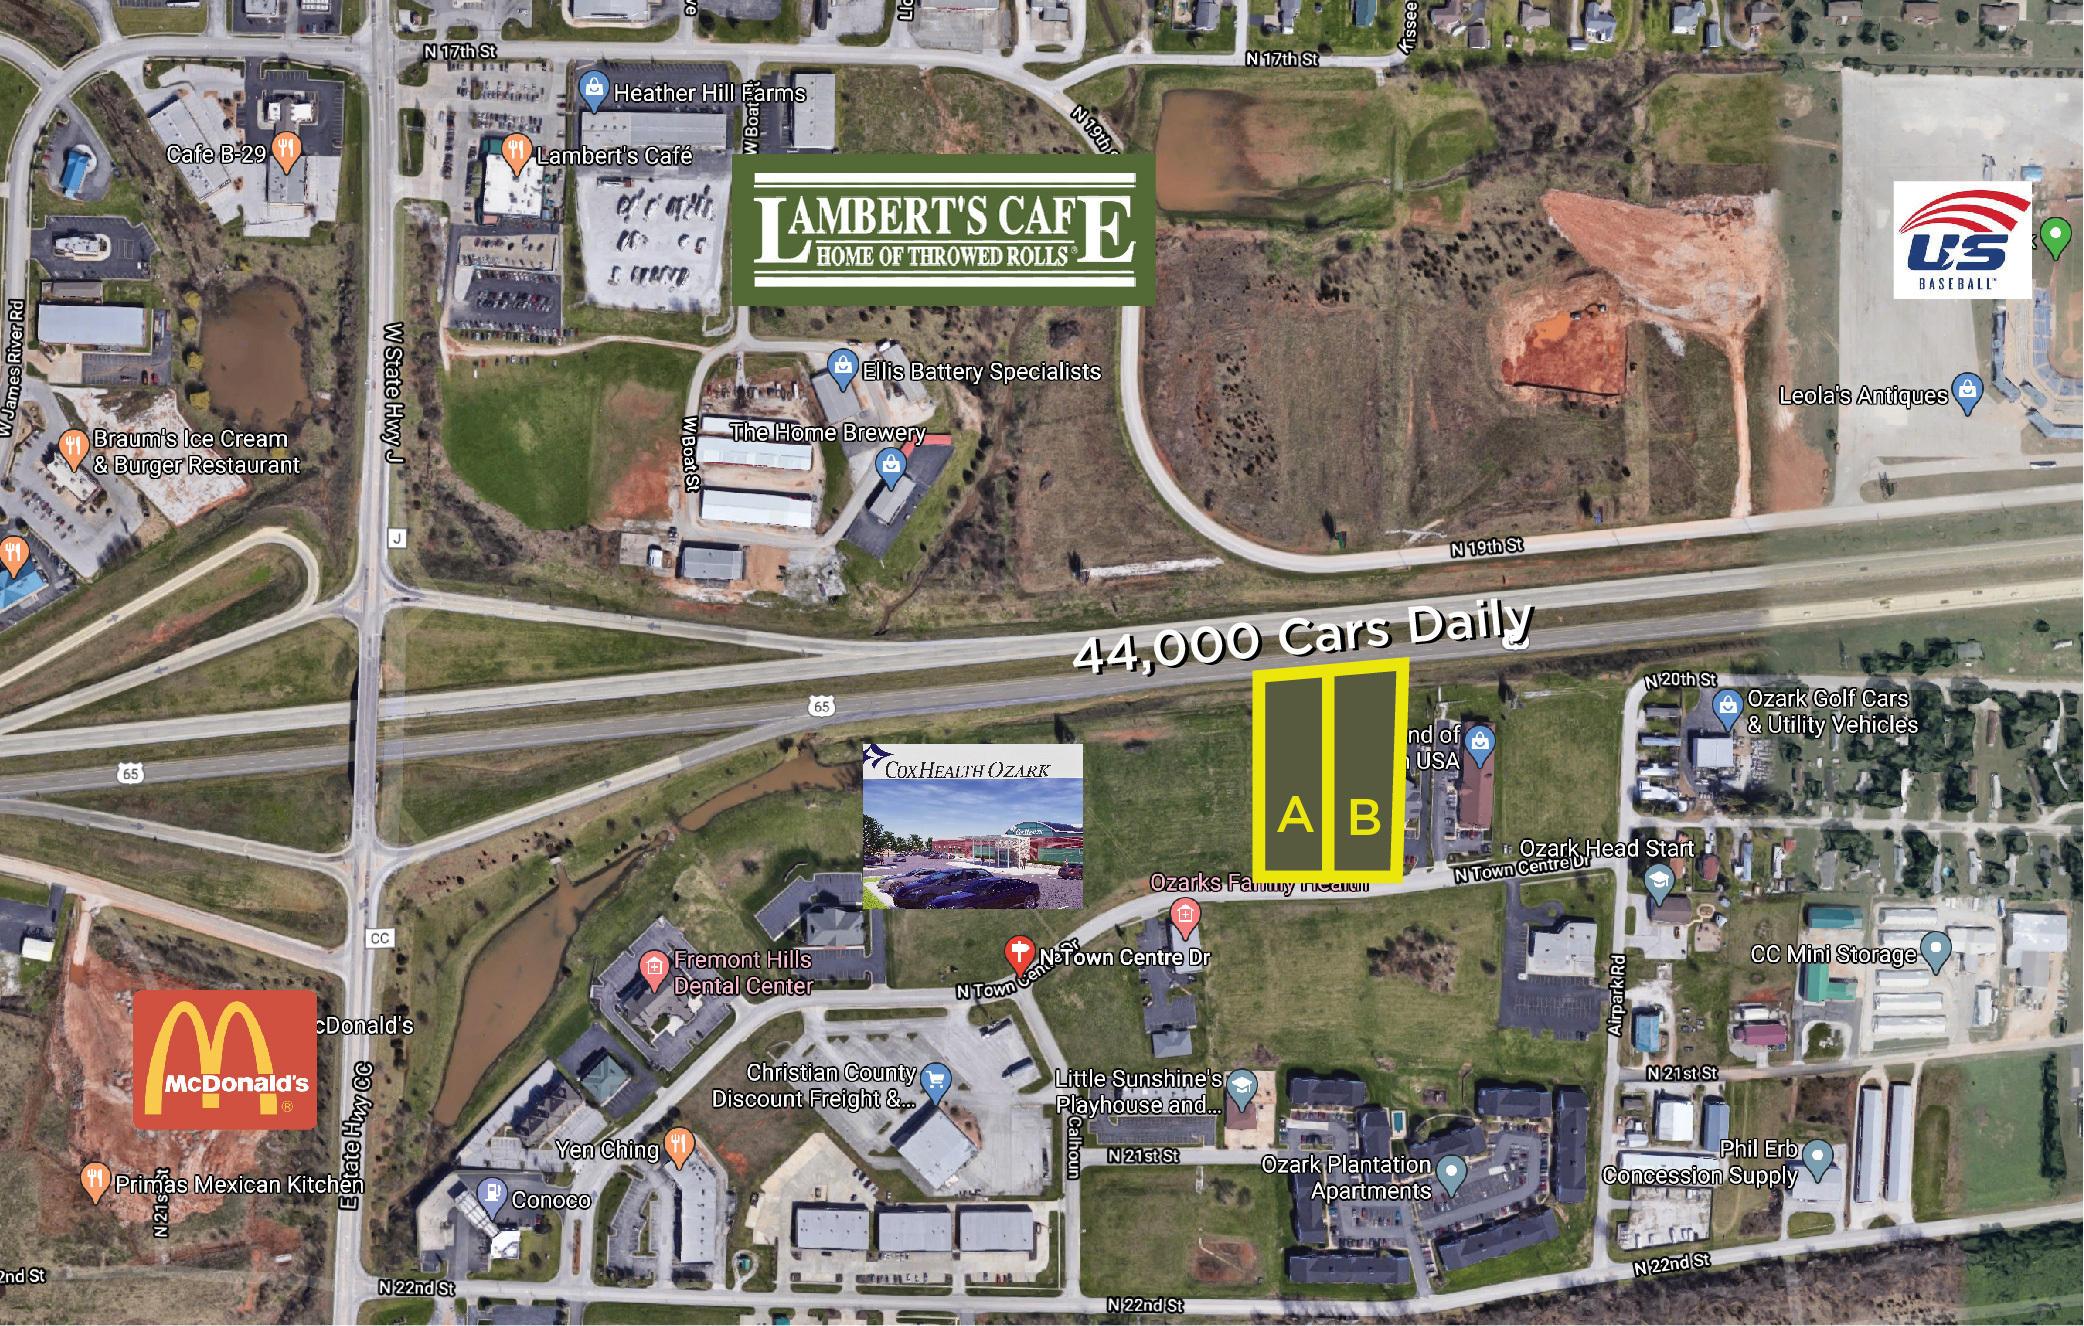 4860-B North Town Centre Drive Ozark, MO 65721